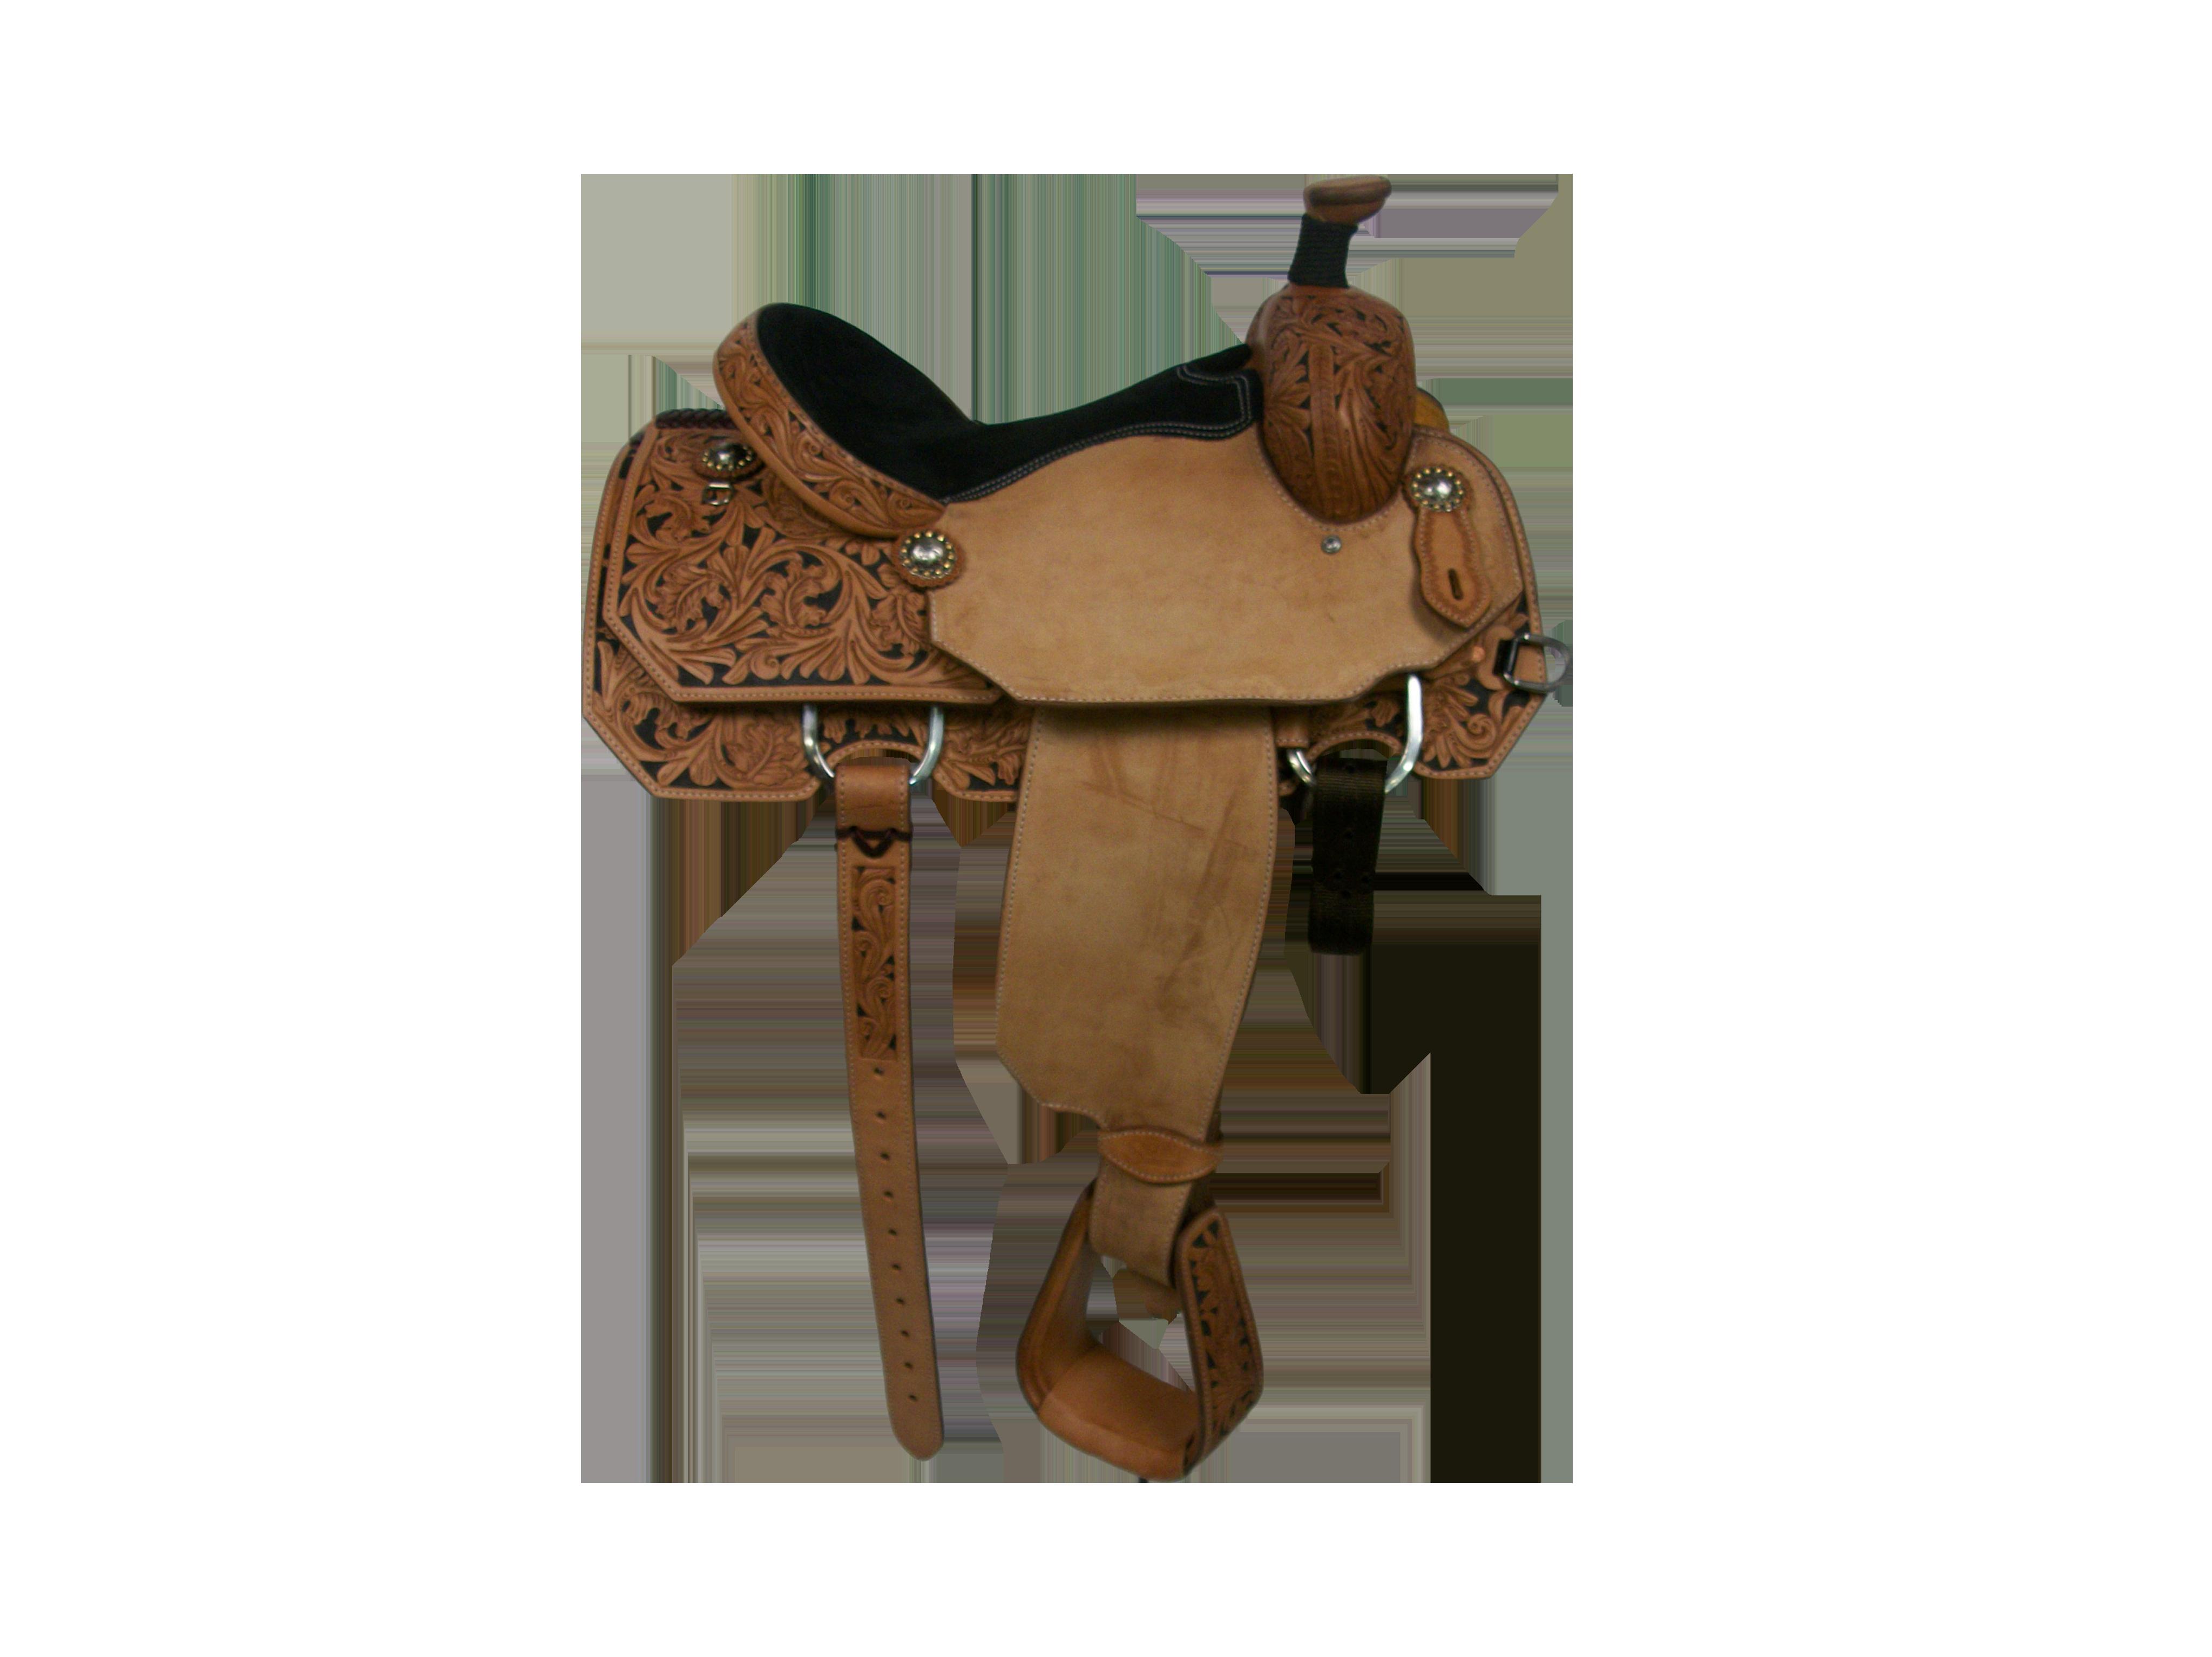 tod slone saddle pad review